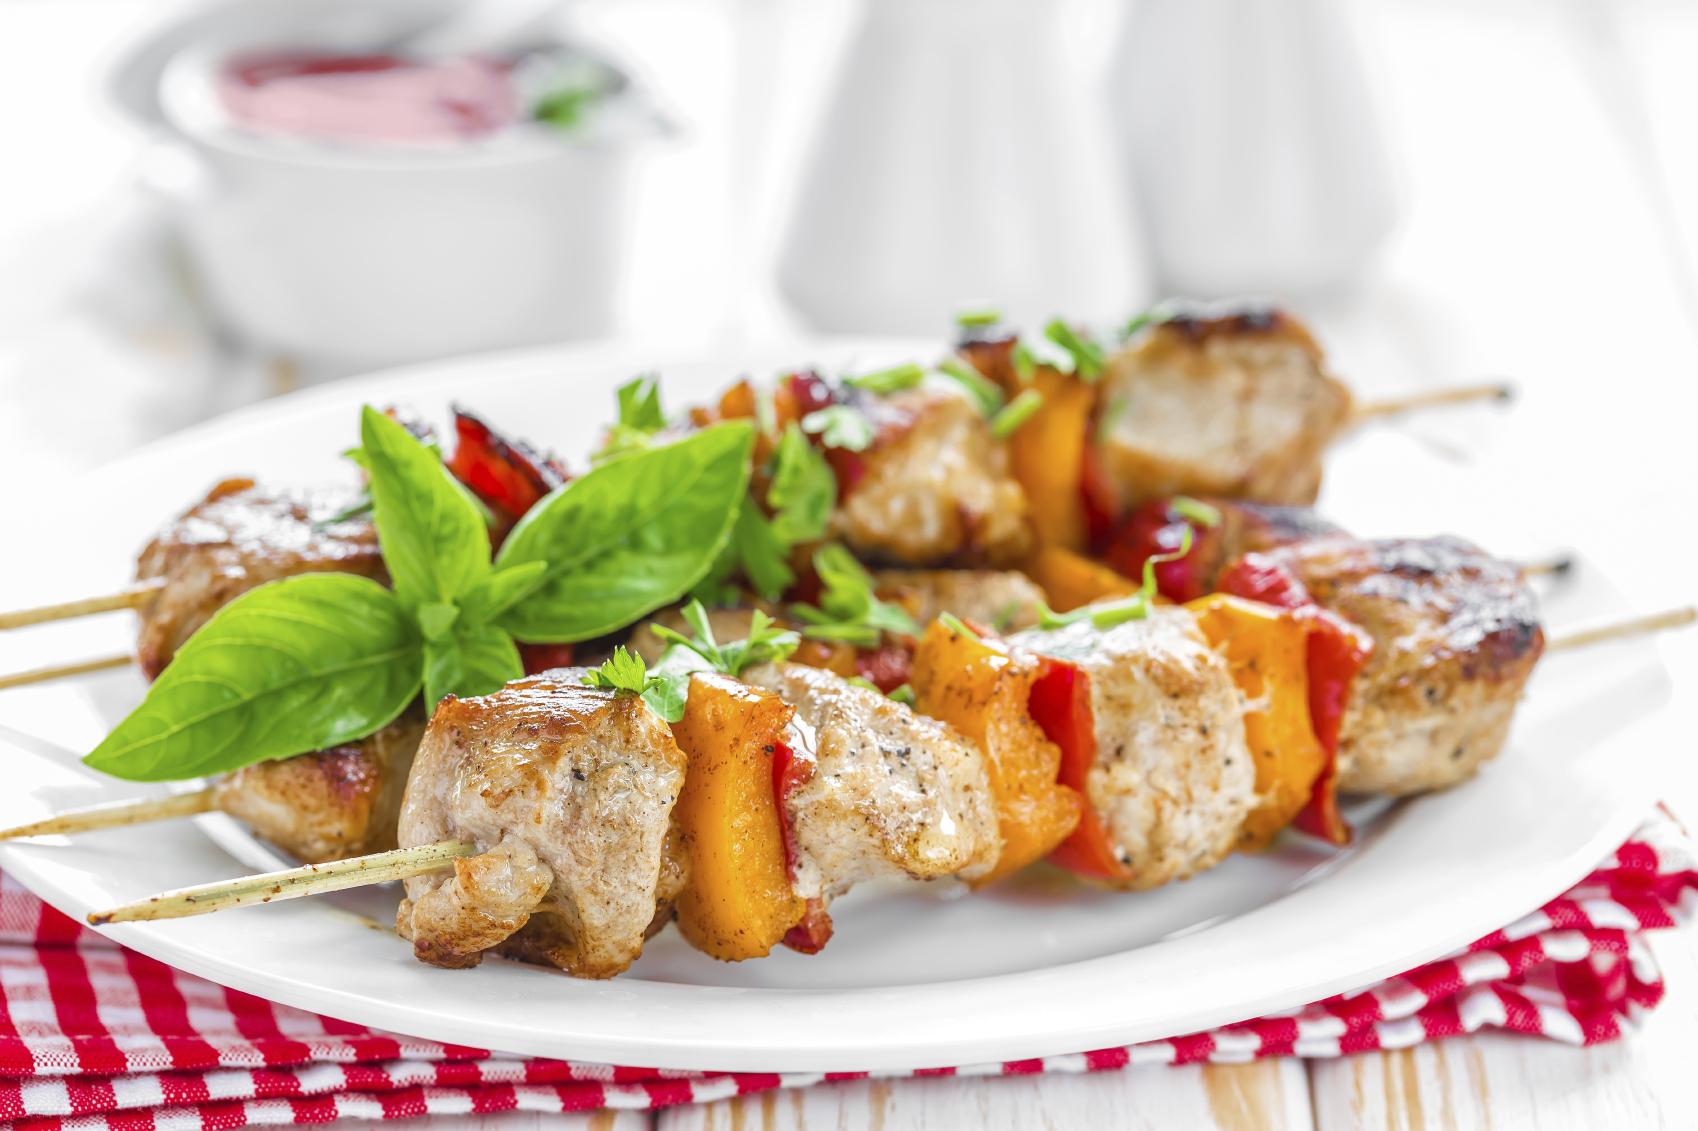 Beef kebab sticks